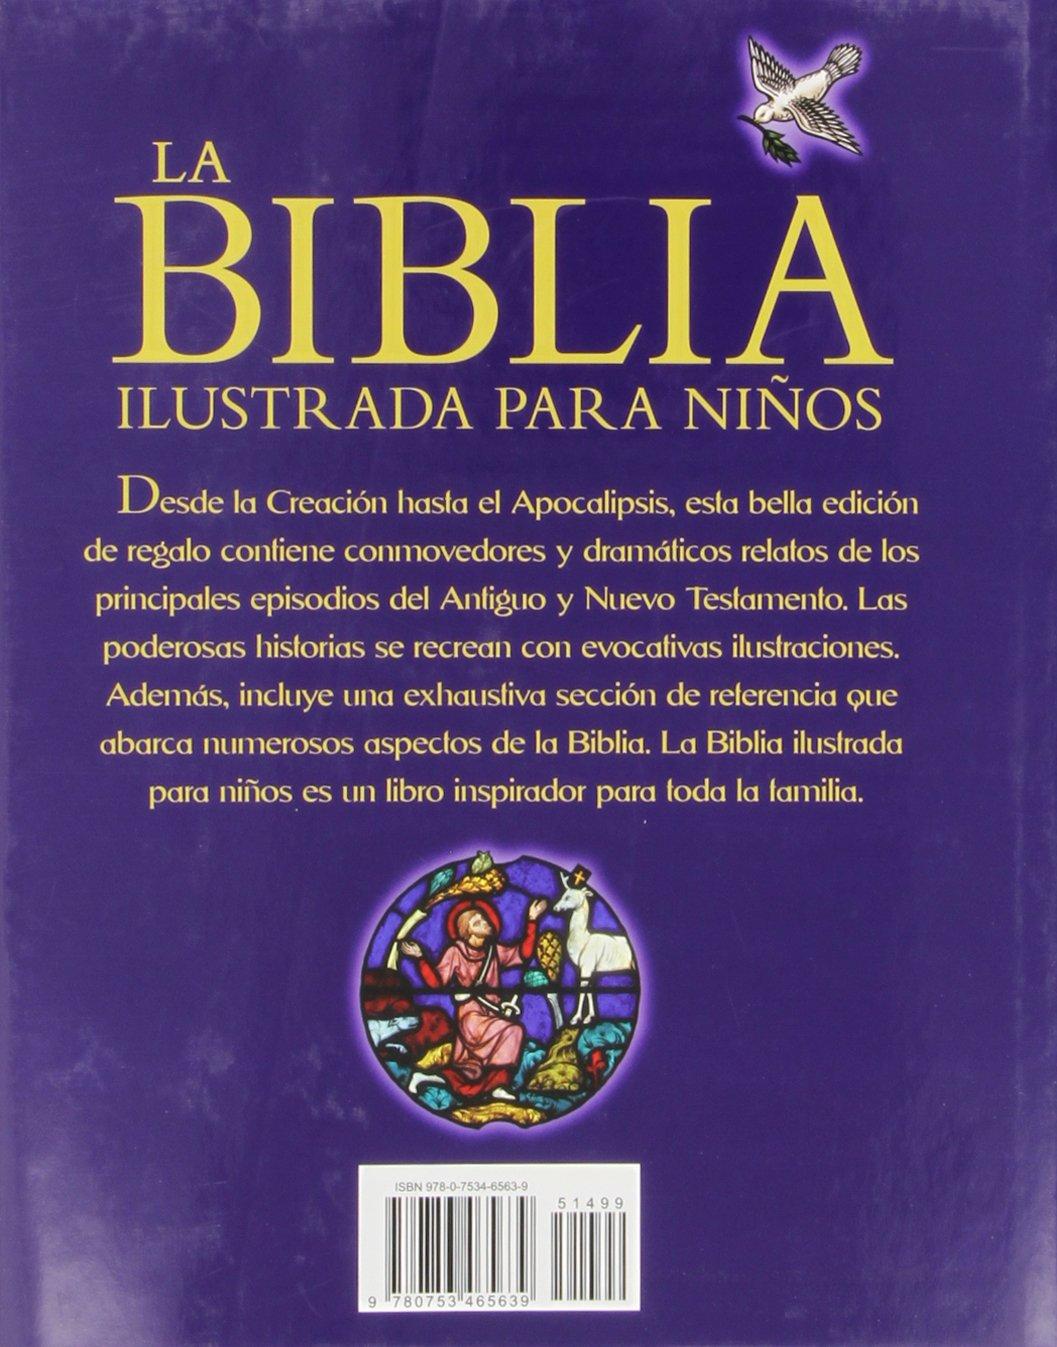 La Biblia Ilustrada para Ninos: Gift edition: Trevor Barnes: 9780753465639: Amazon.com: Books